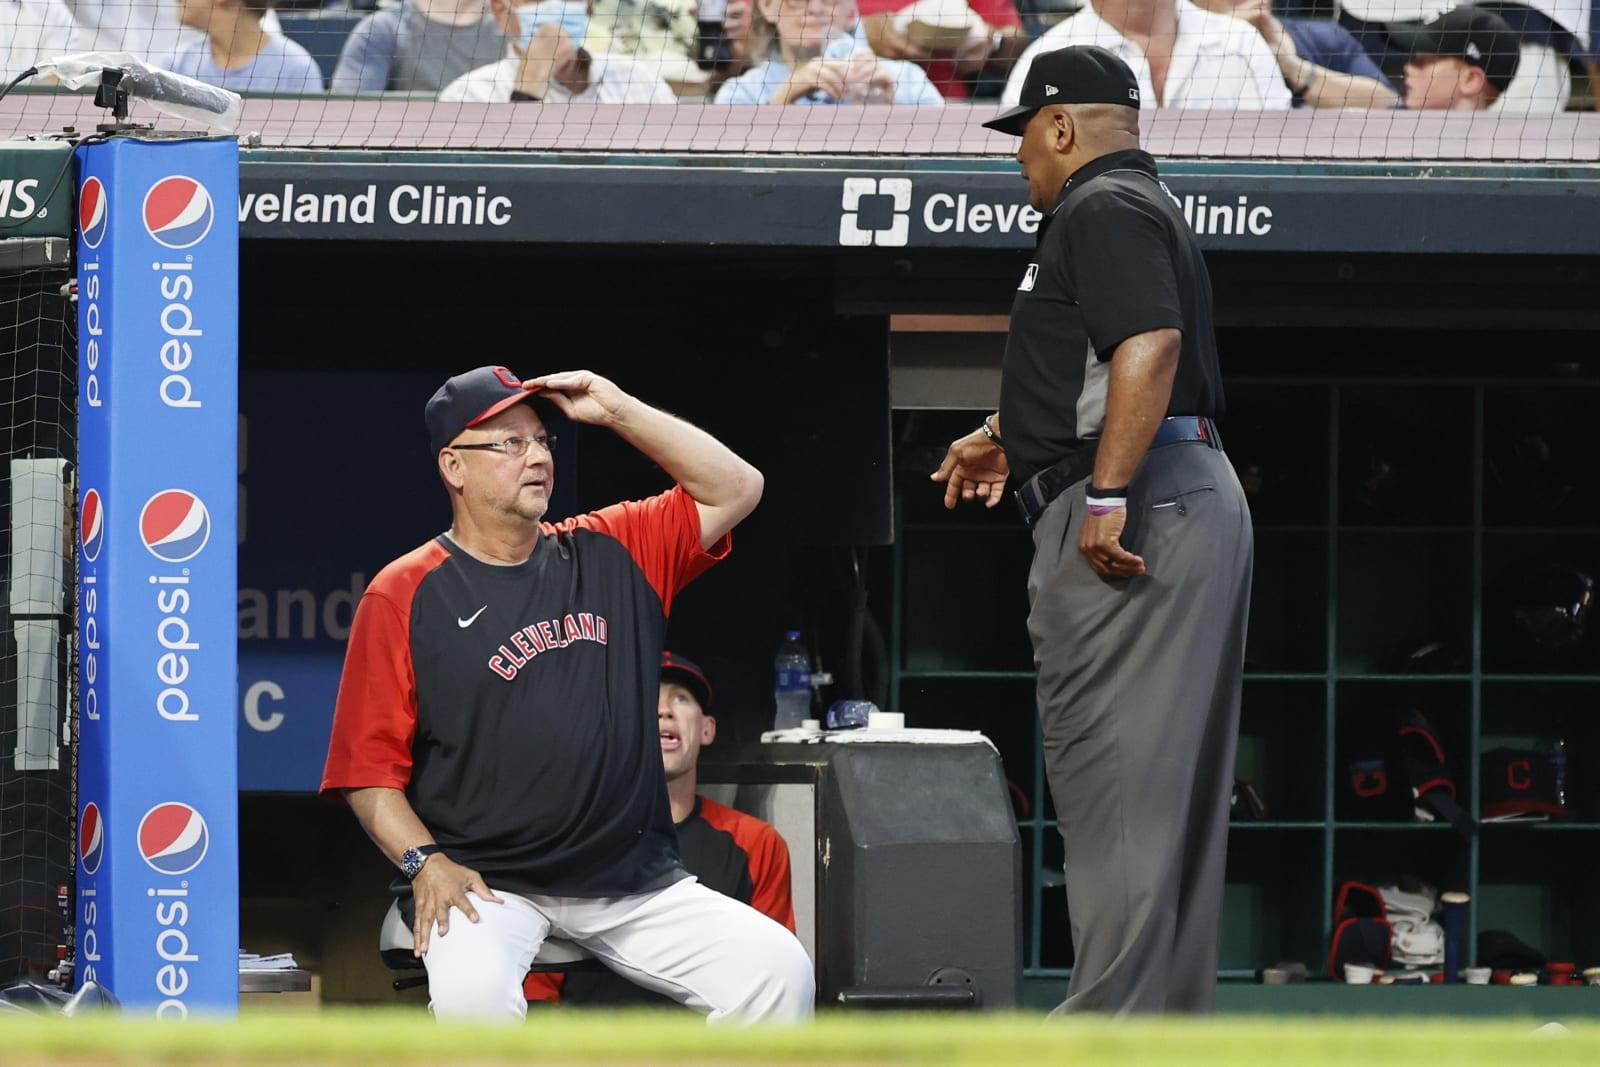 Cleveland Indians, Terry Francona, Cleveland Guardians